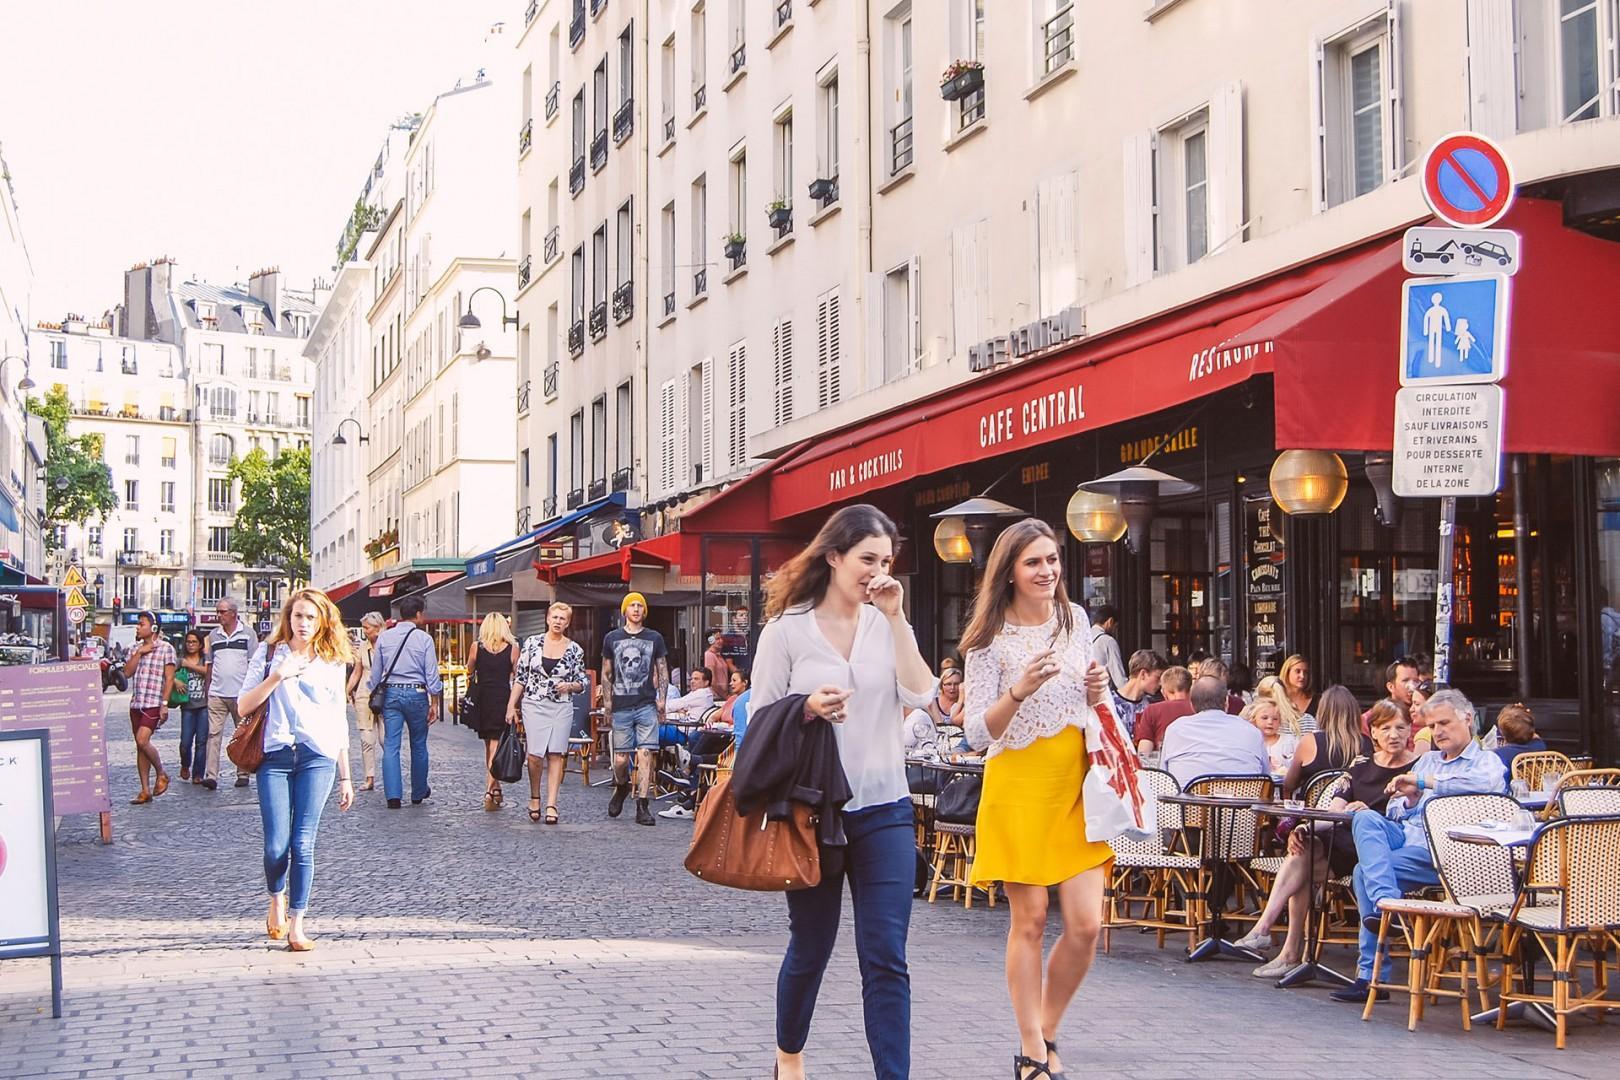 Walk along the wonderful rue Cler